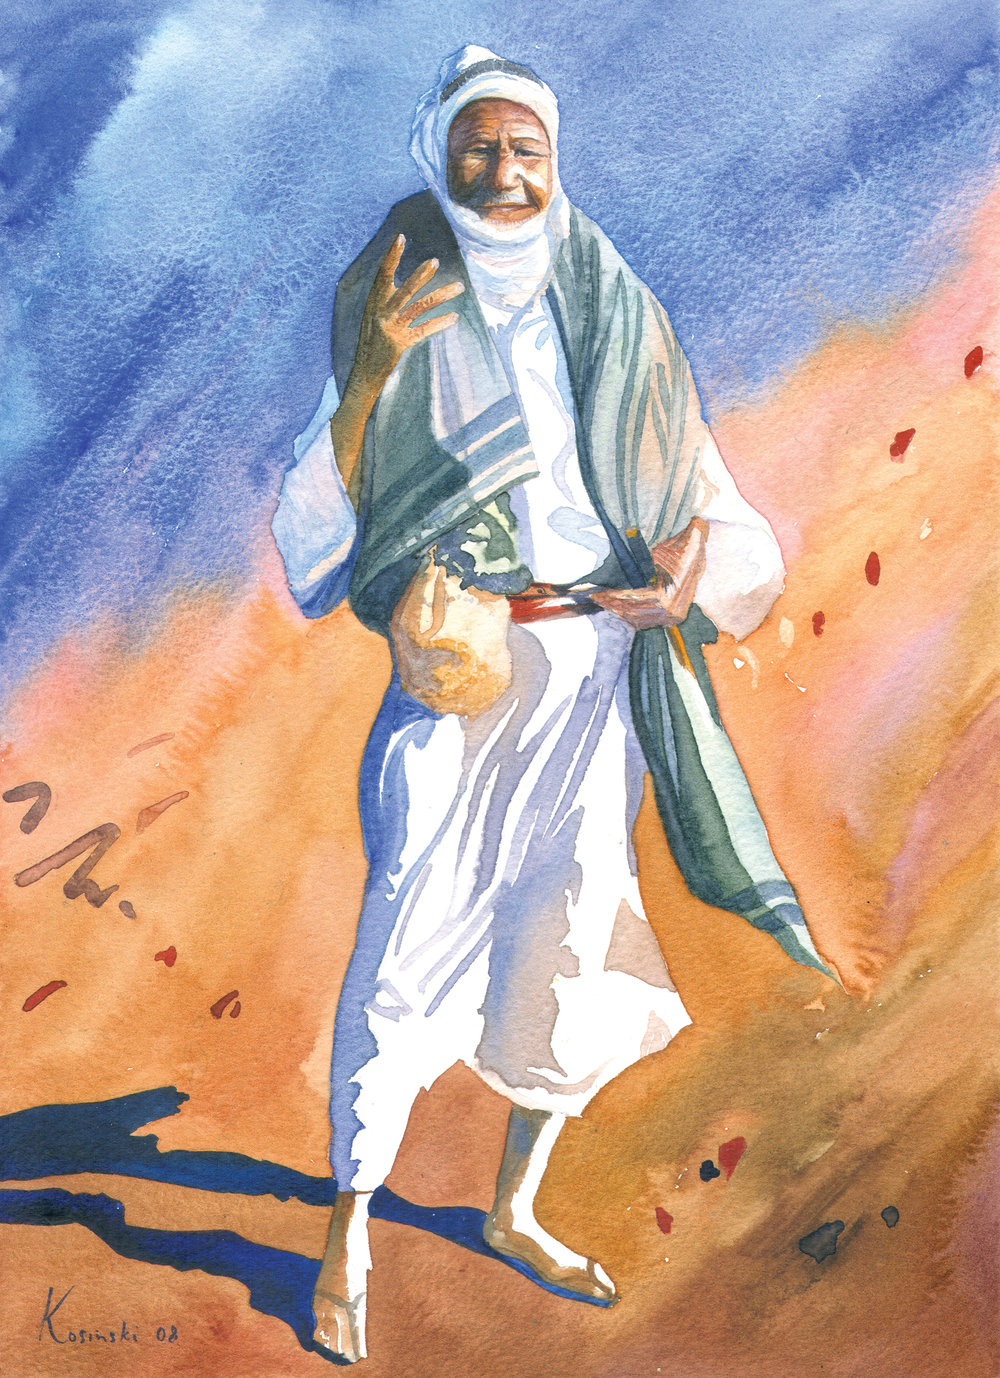 Bedouin Traveler, Sinai